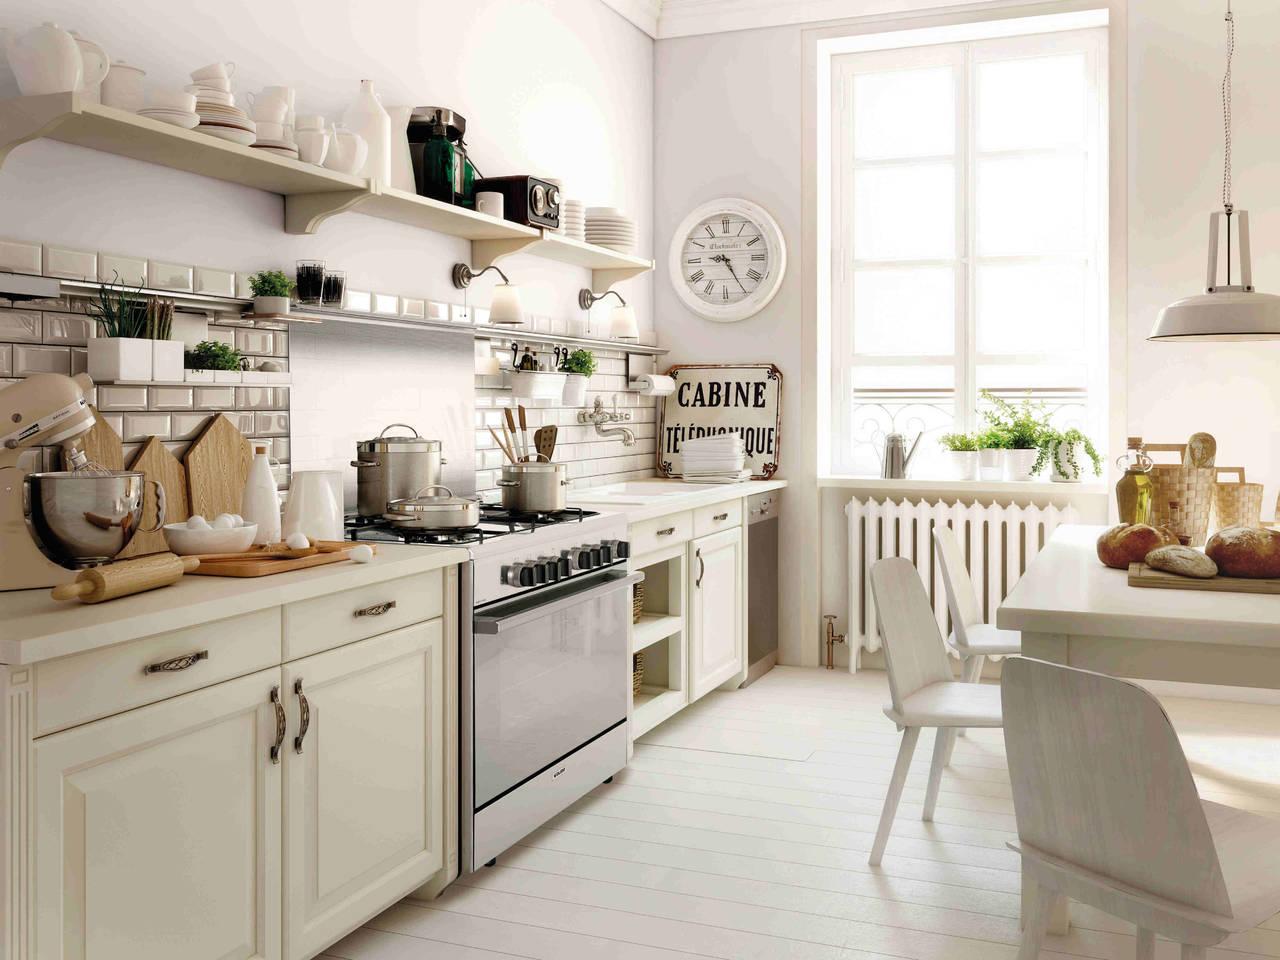 Cucine freestanding. Cottura da chef